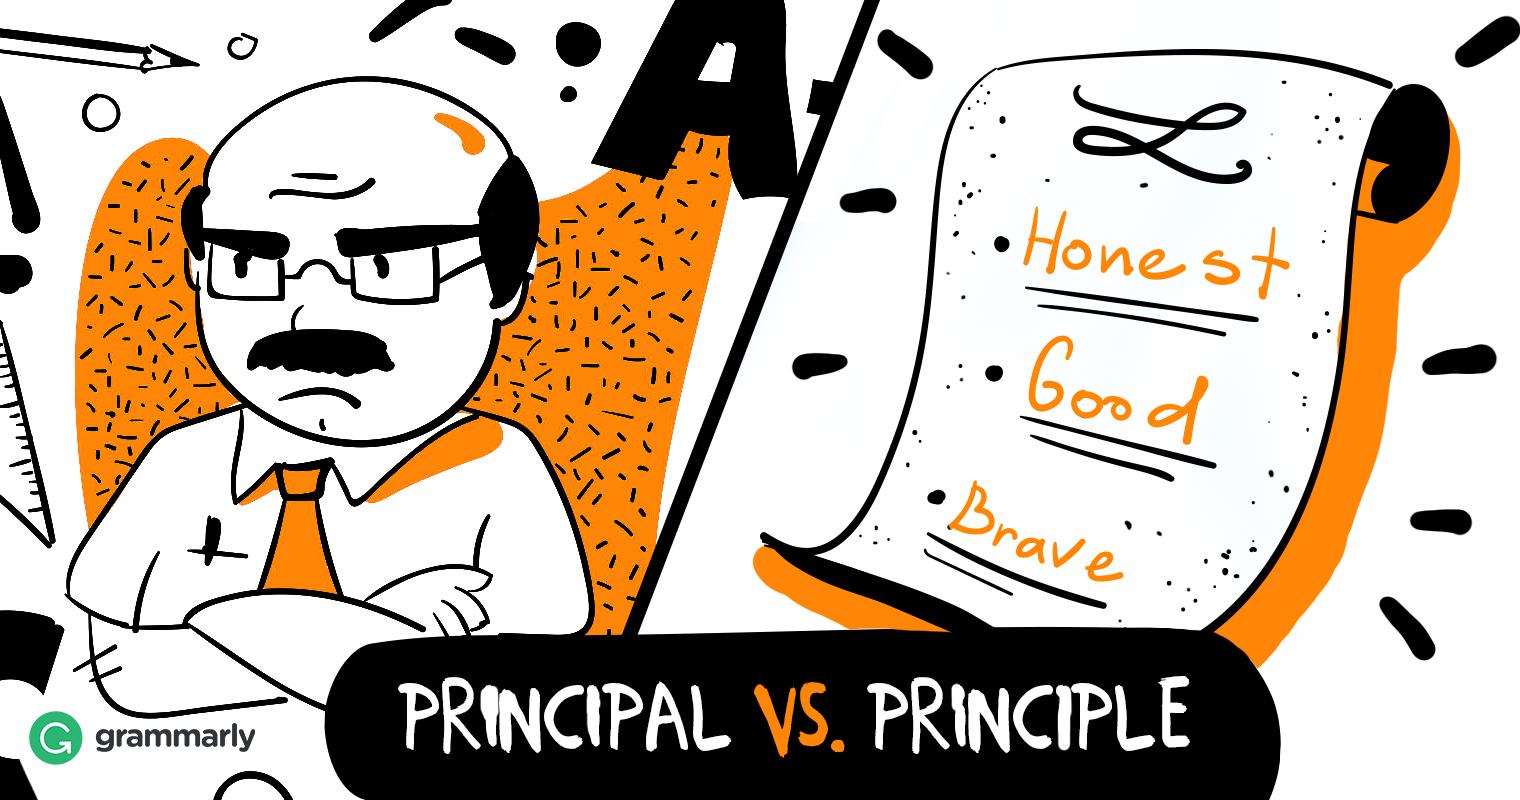 Principle vs. Principal image